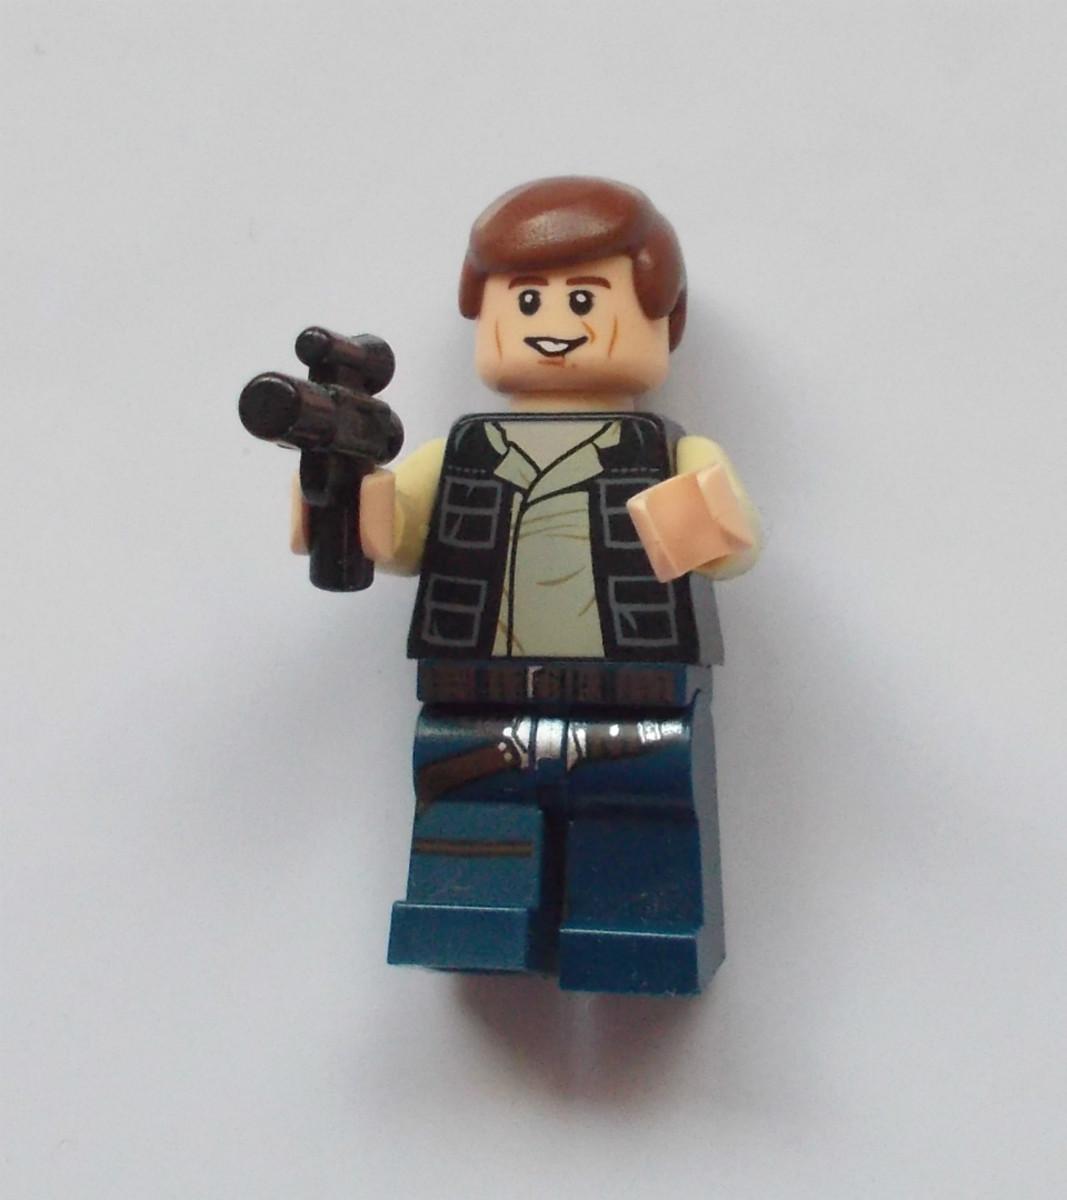 Harrison Ford's Han Solo